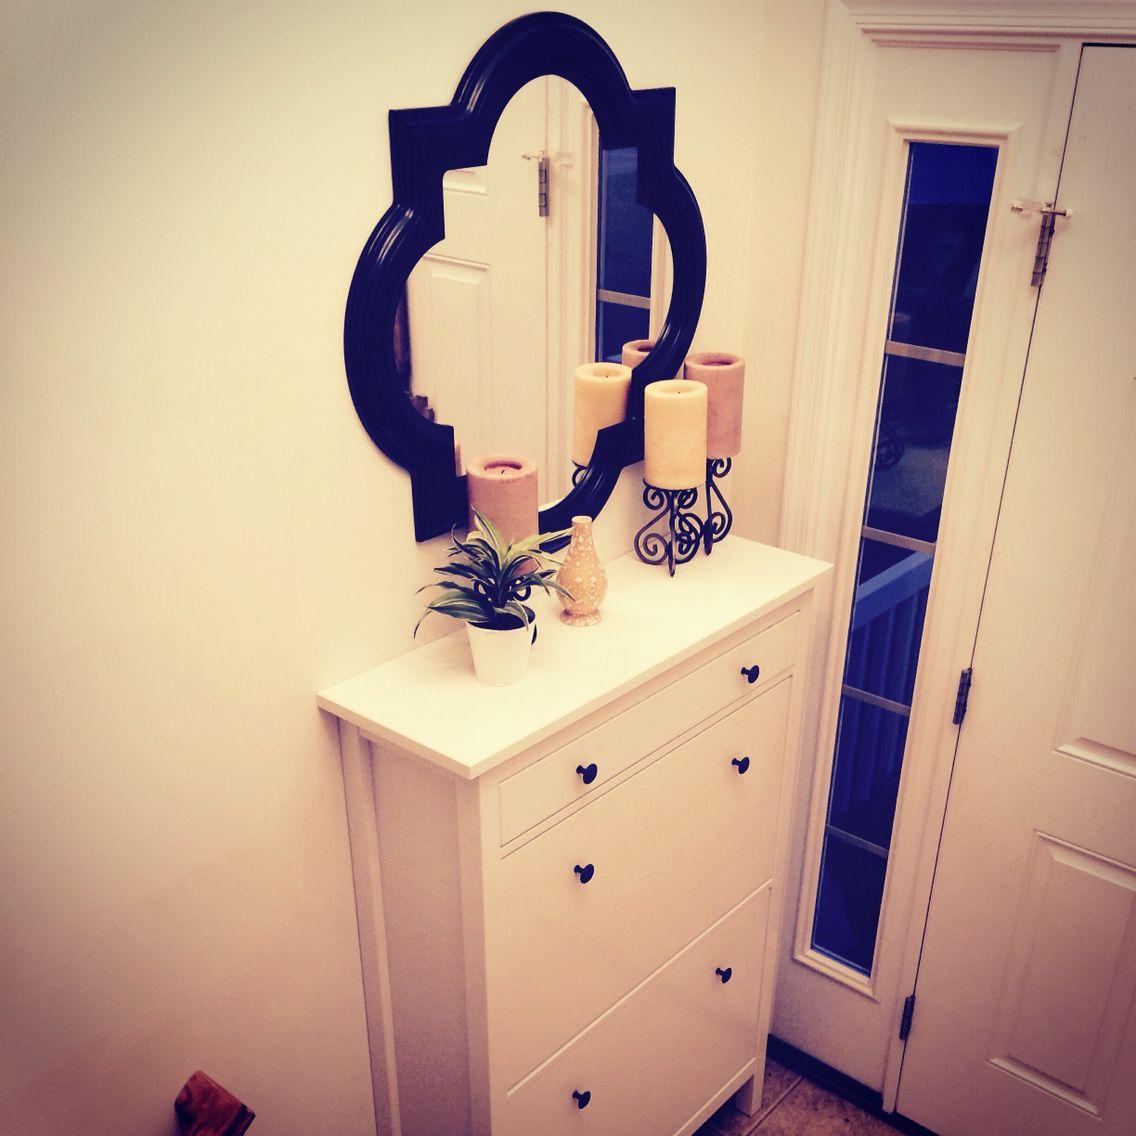 Super cute small bi-level split-level entryway!!! #IKEA #HOBBYLOBBY ...